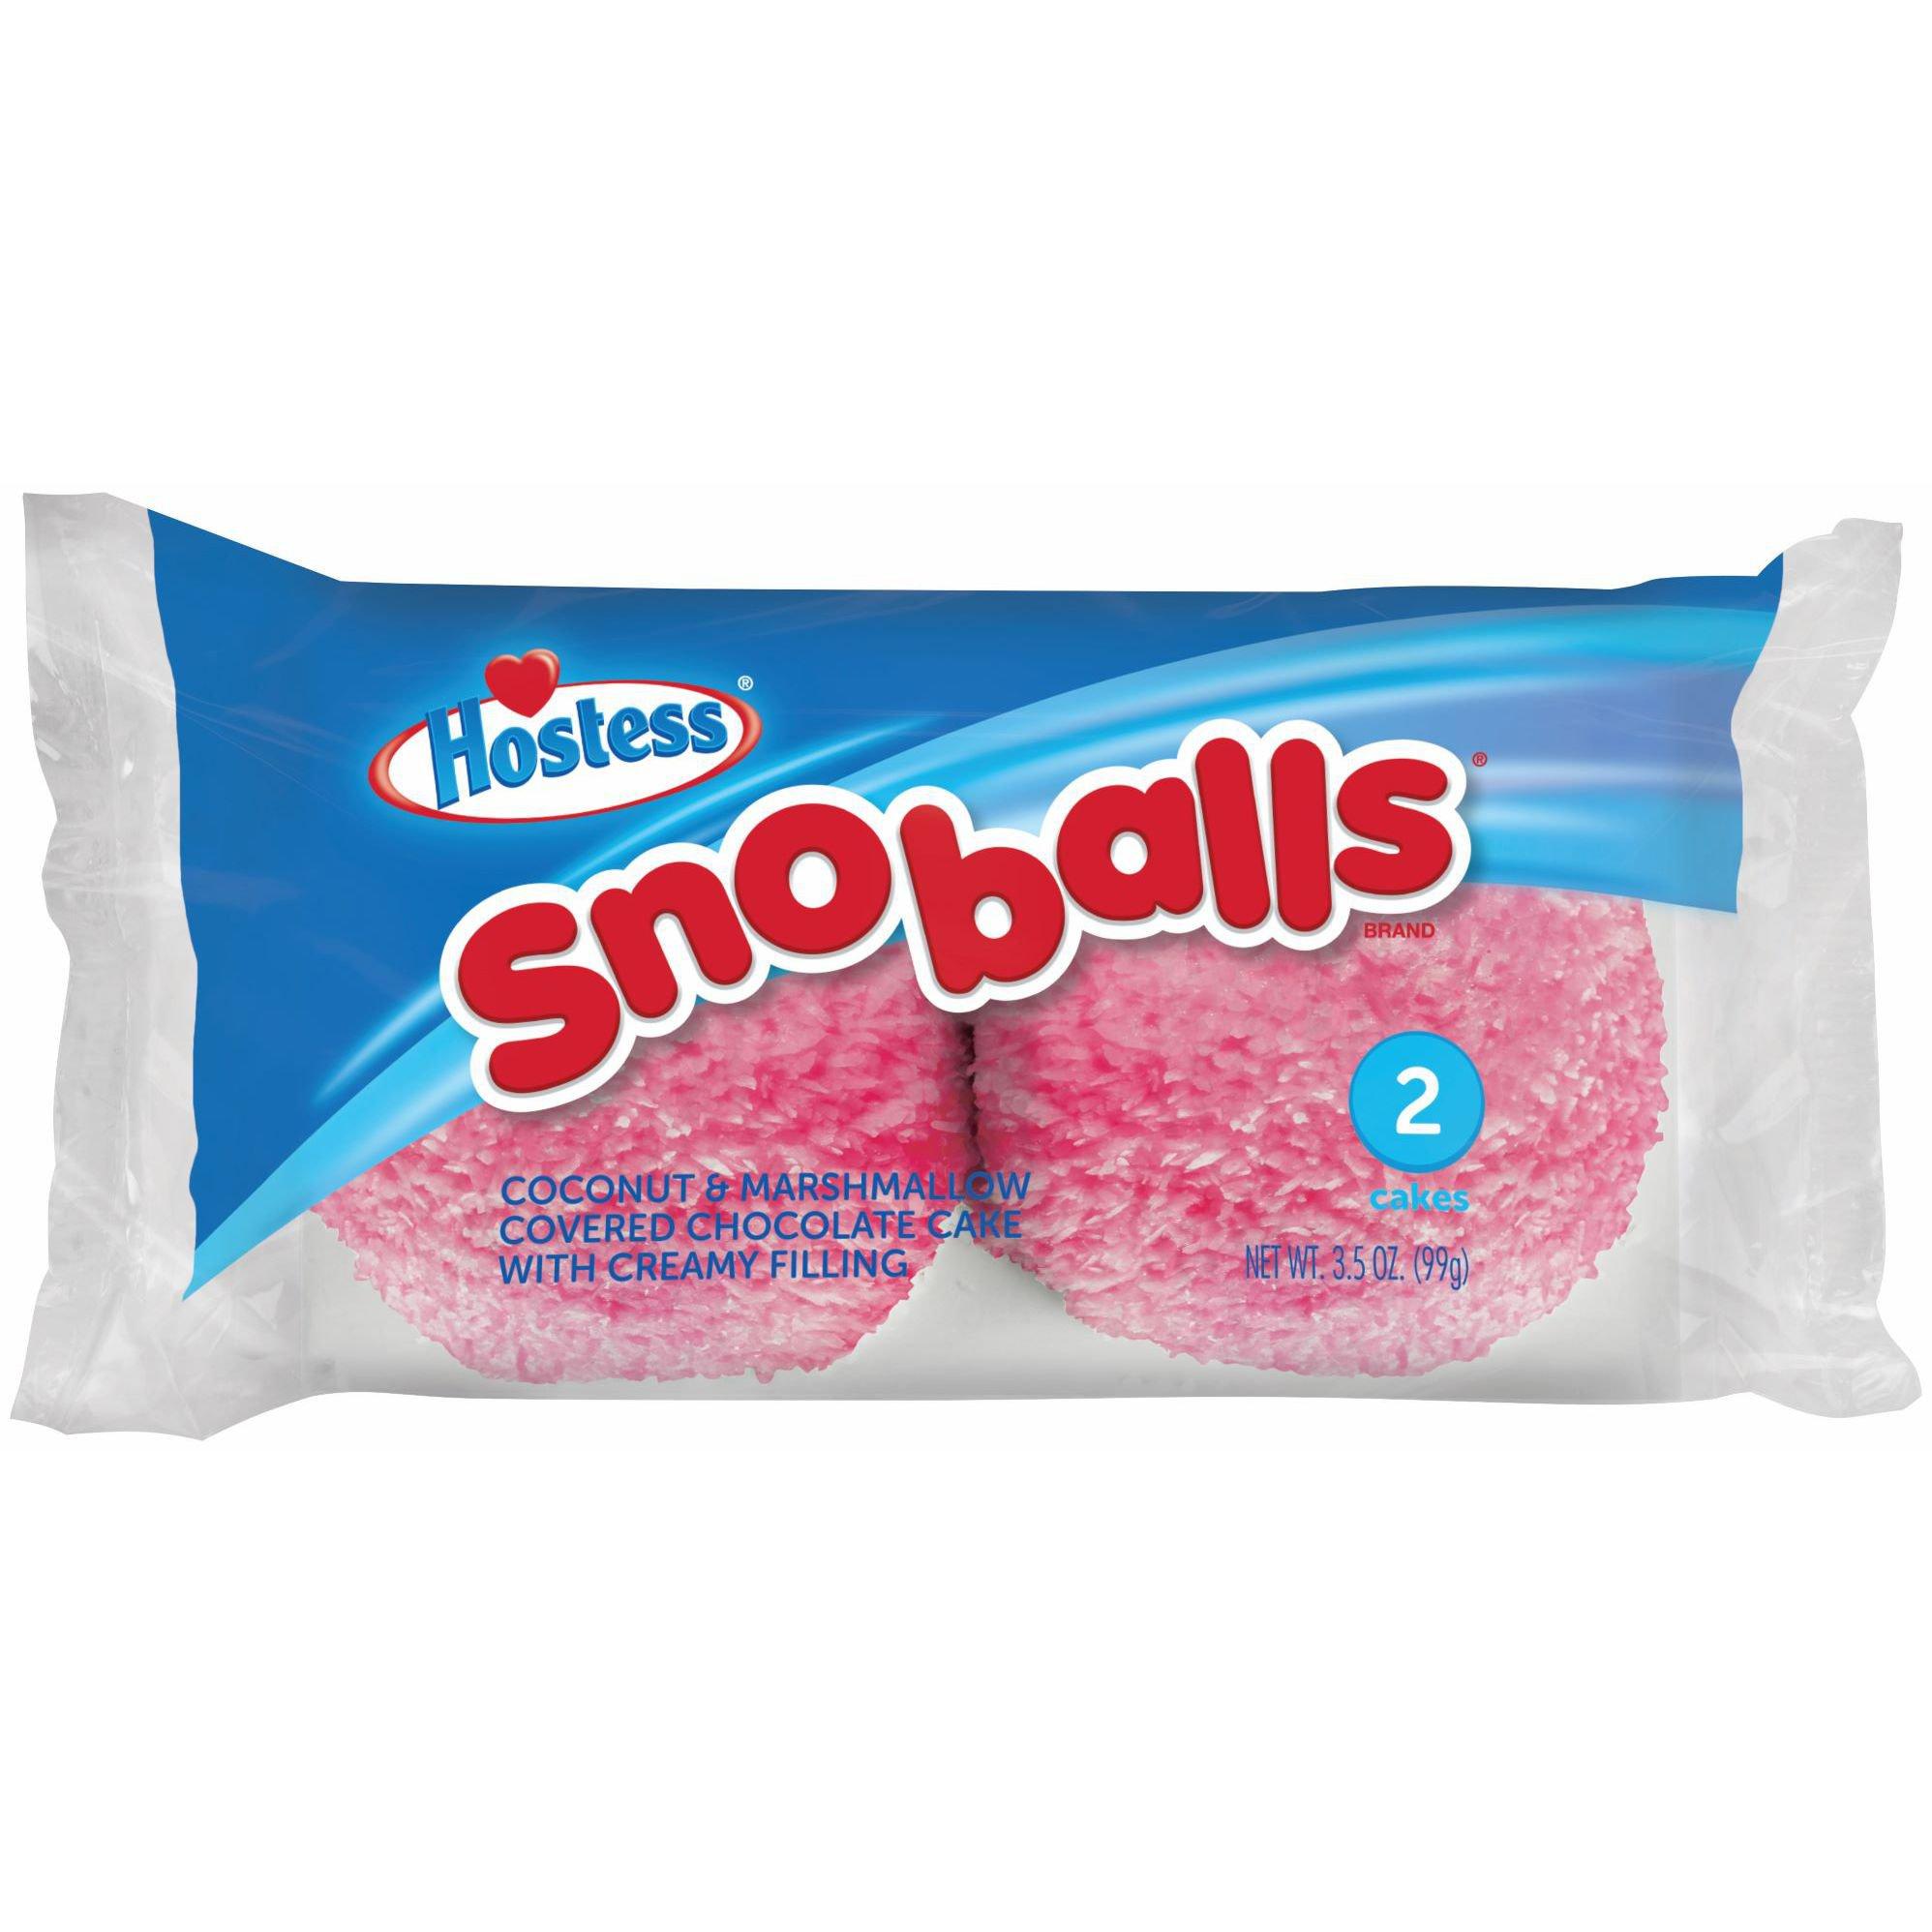 Hostess Sno Balls 2-pack